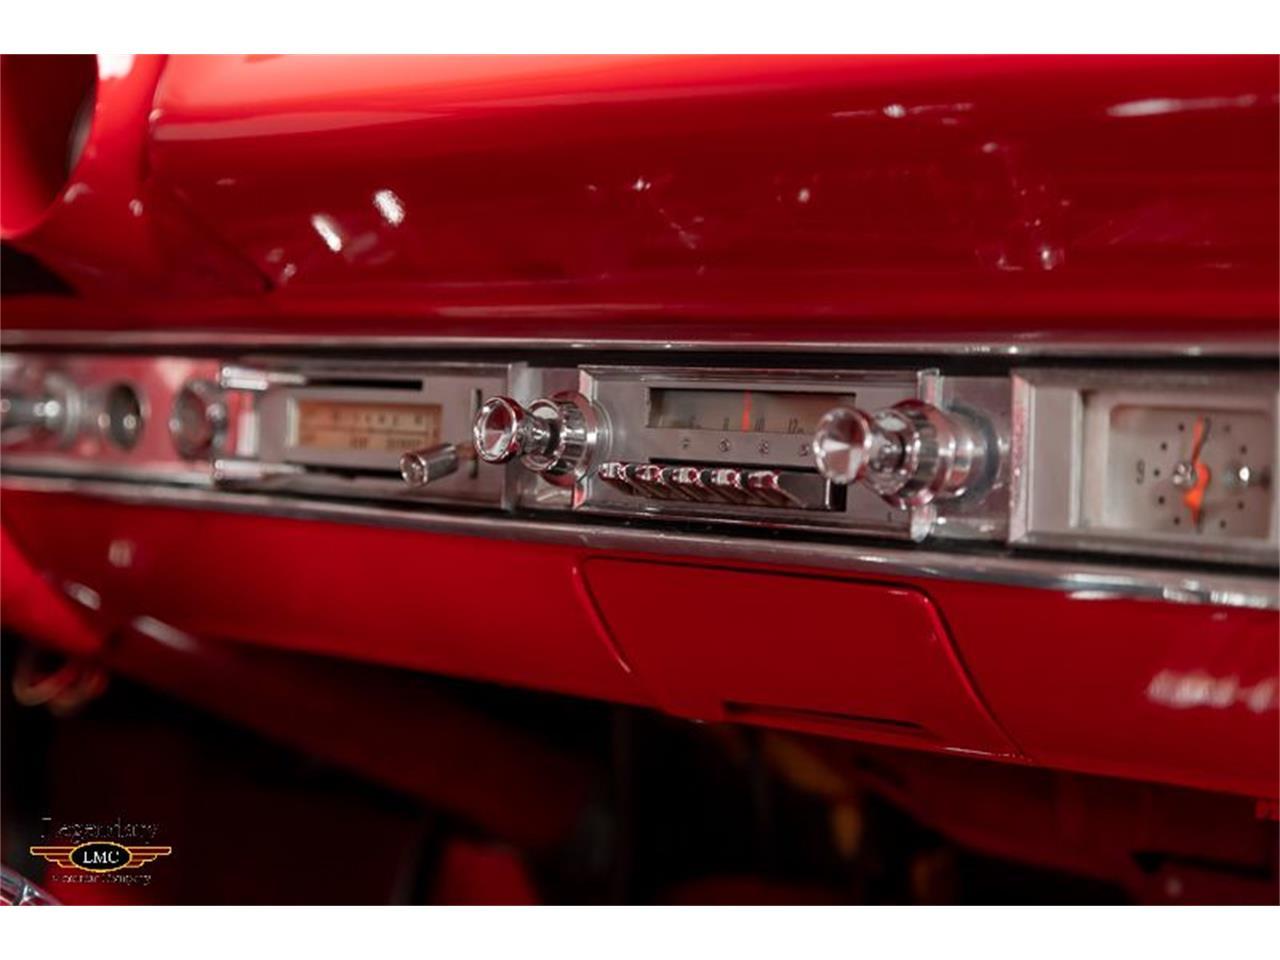 1964 Ford Galaxie 500 XL (CC-1246605) for sale in Halton Hills, Ontario